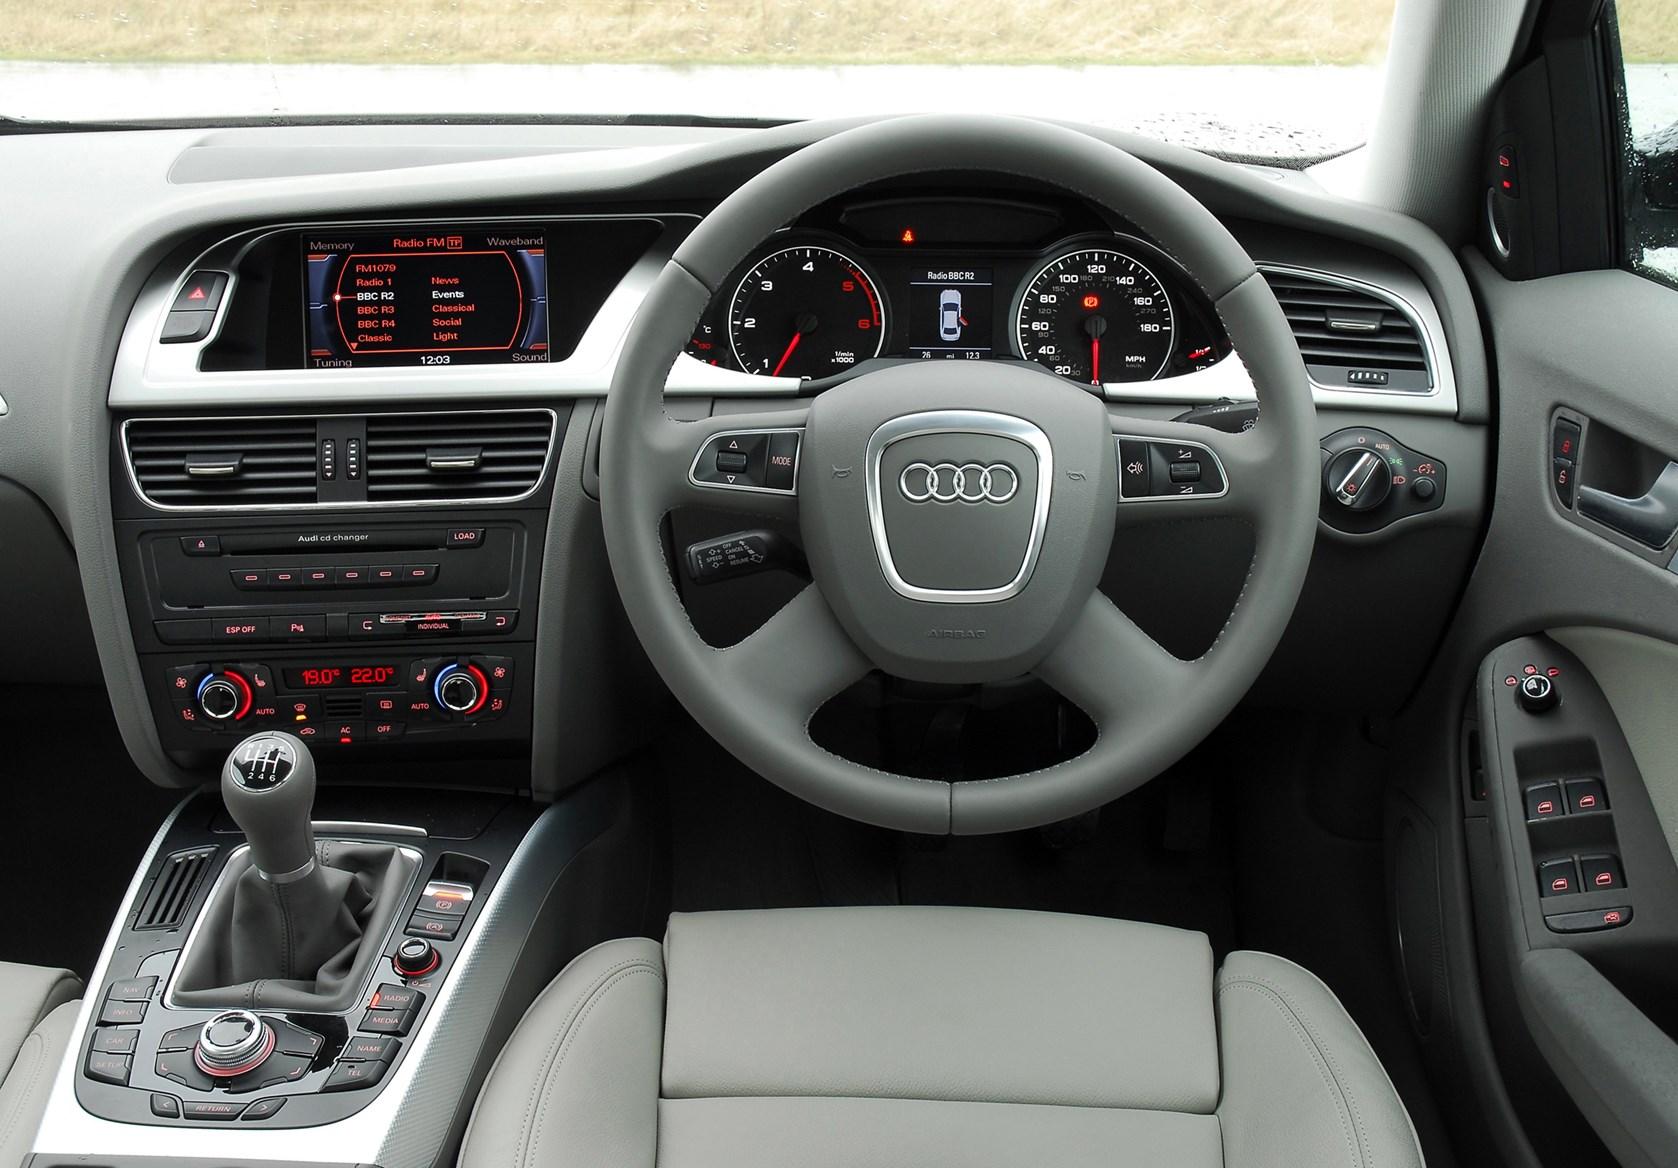 Audi A4 Saloon Review 2008 2015 Parkers